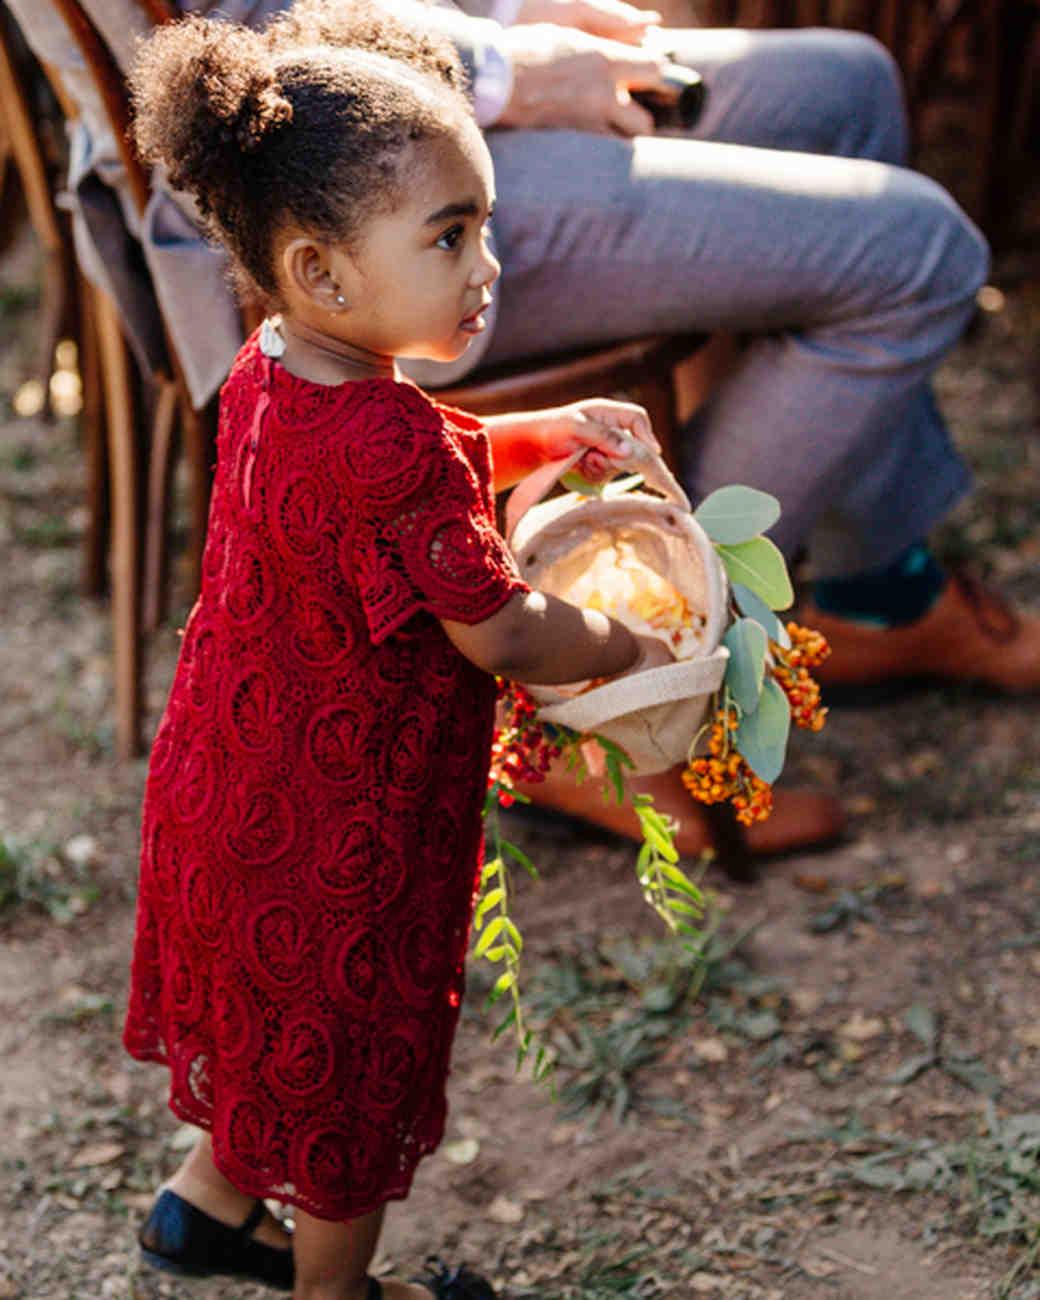 erica-jordy-wedding-flowergirl-2538-s111971-0715.jpg